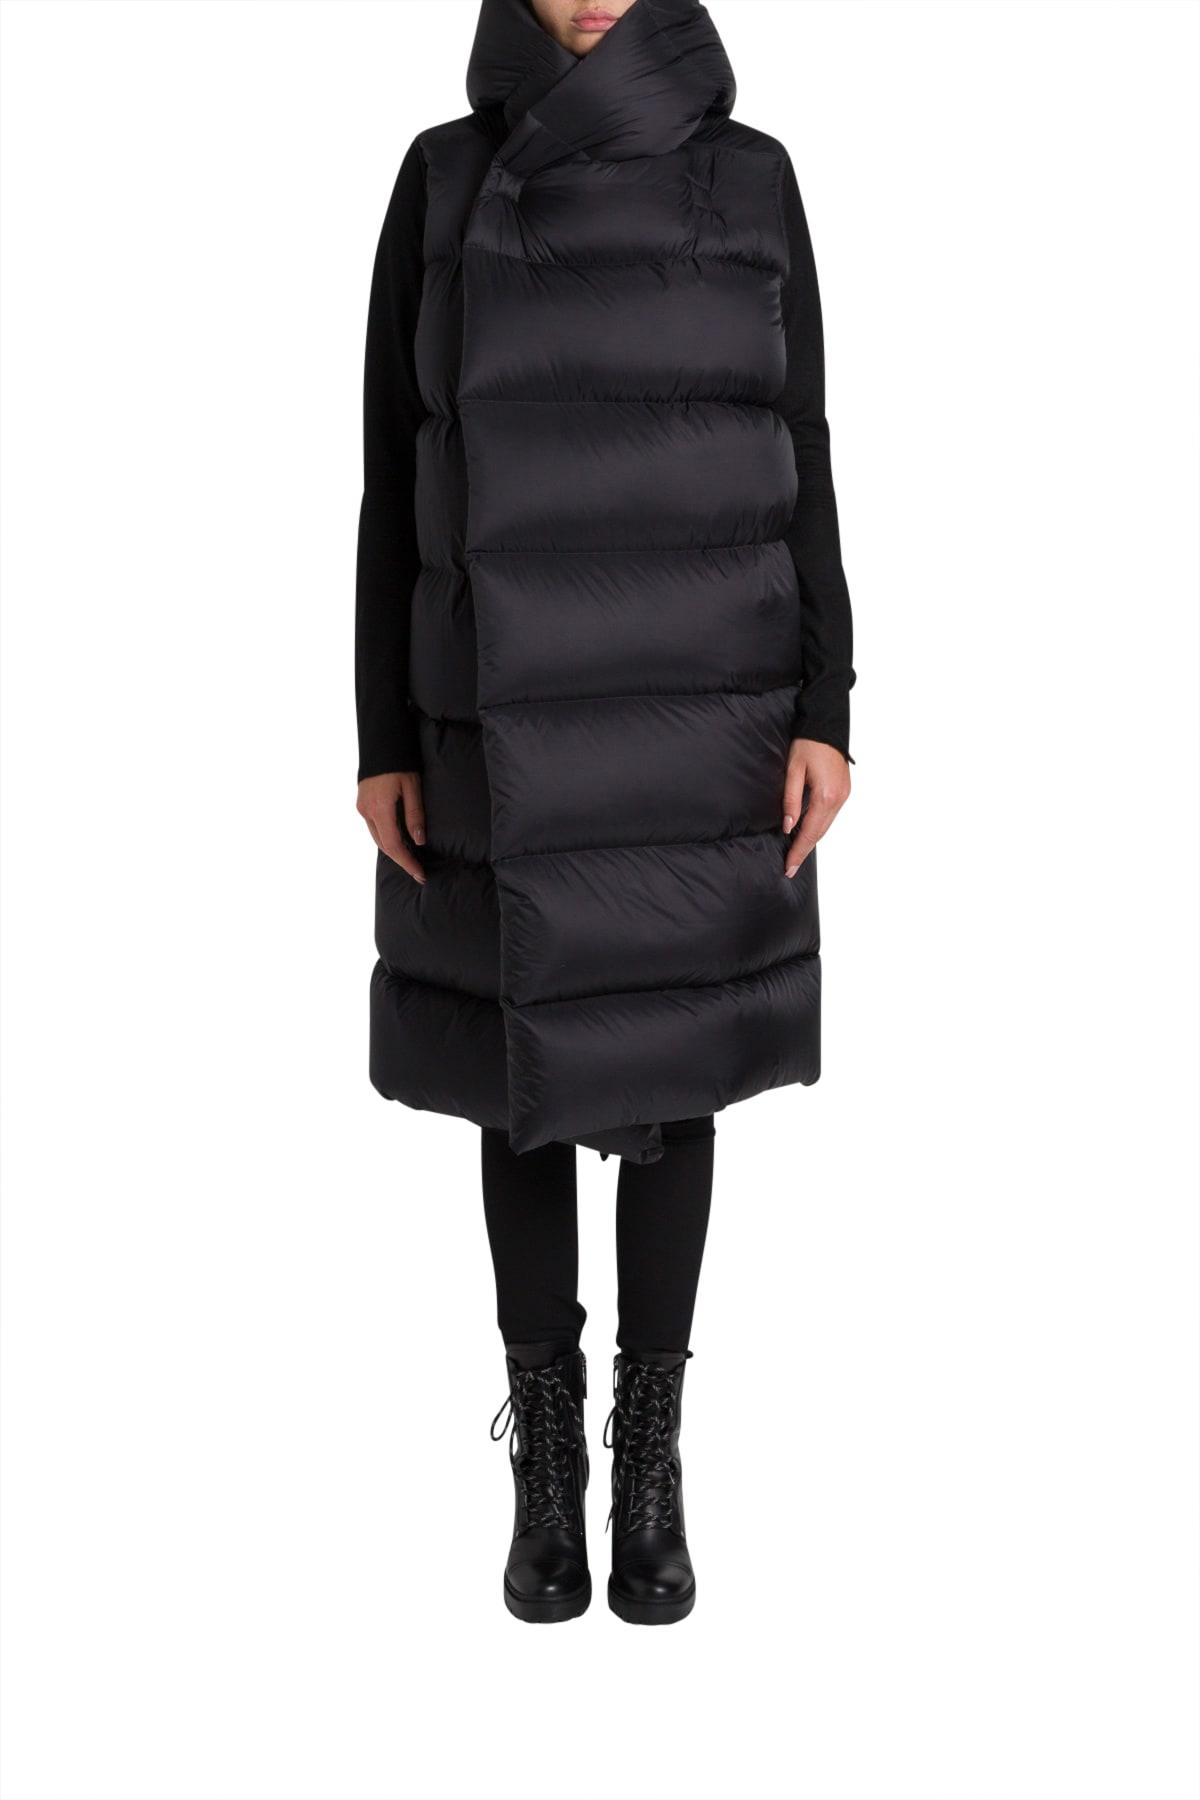 Rick Owens Larry Liner Coat